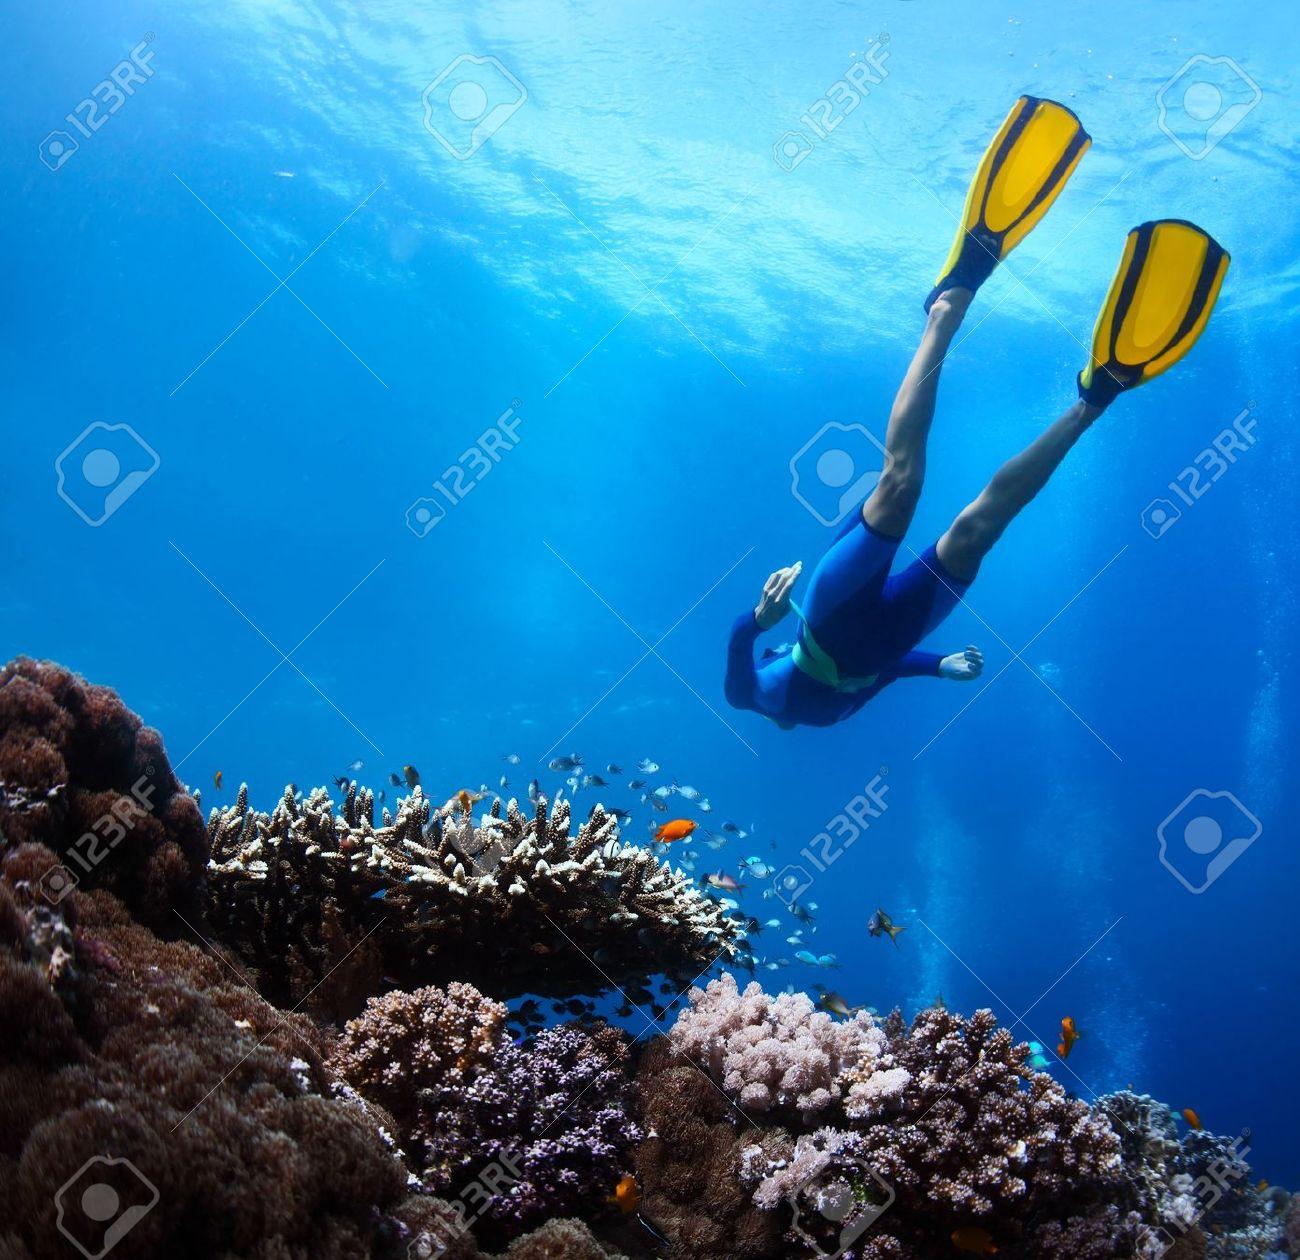 Freediver gliding underwater over vivid coral reef Stock Photo - 20329071